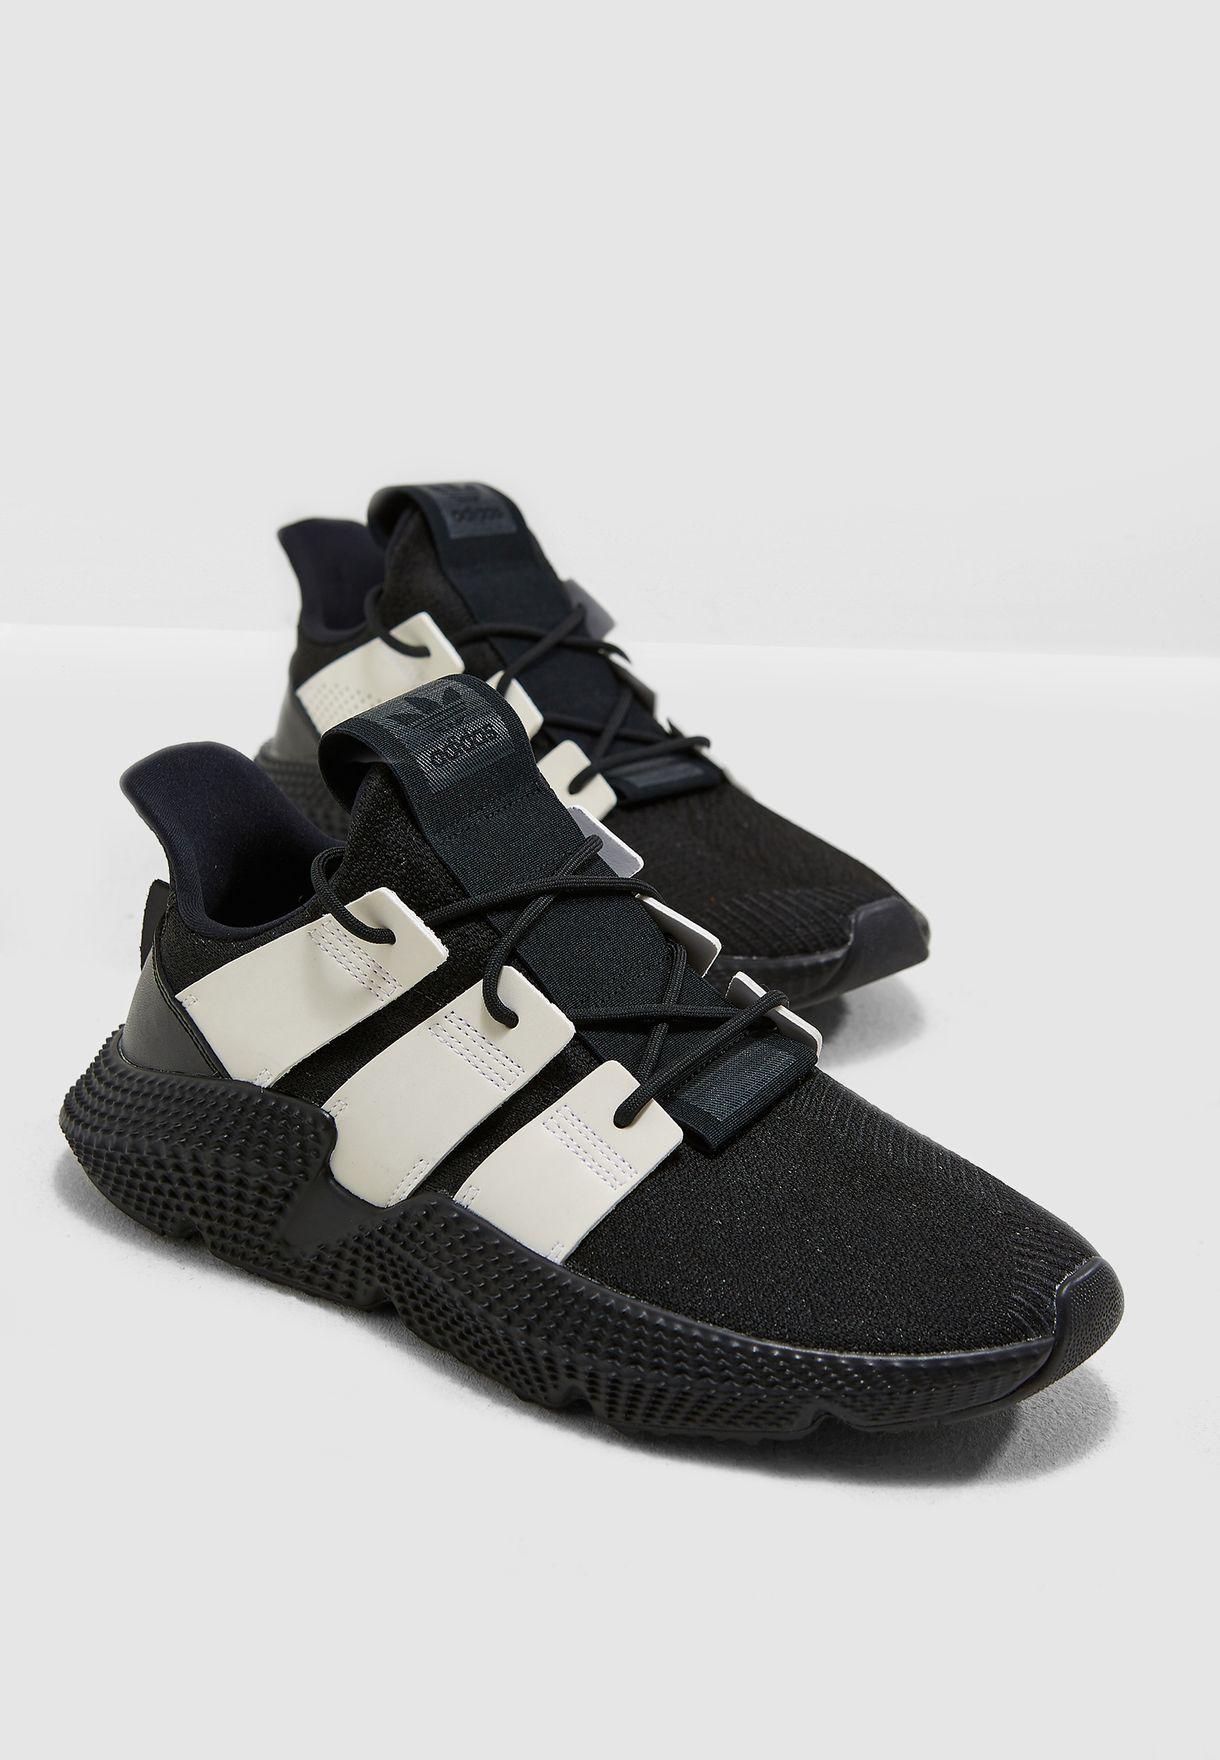 meet 1c94b ff3c1 Shop adidas Originals black Prophere B37462 for Men in Saudi ...